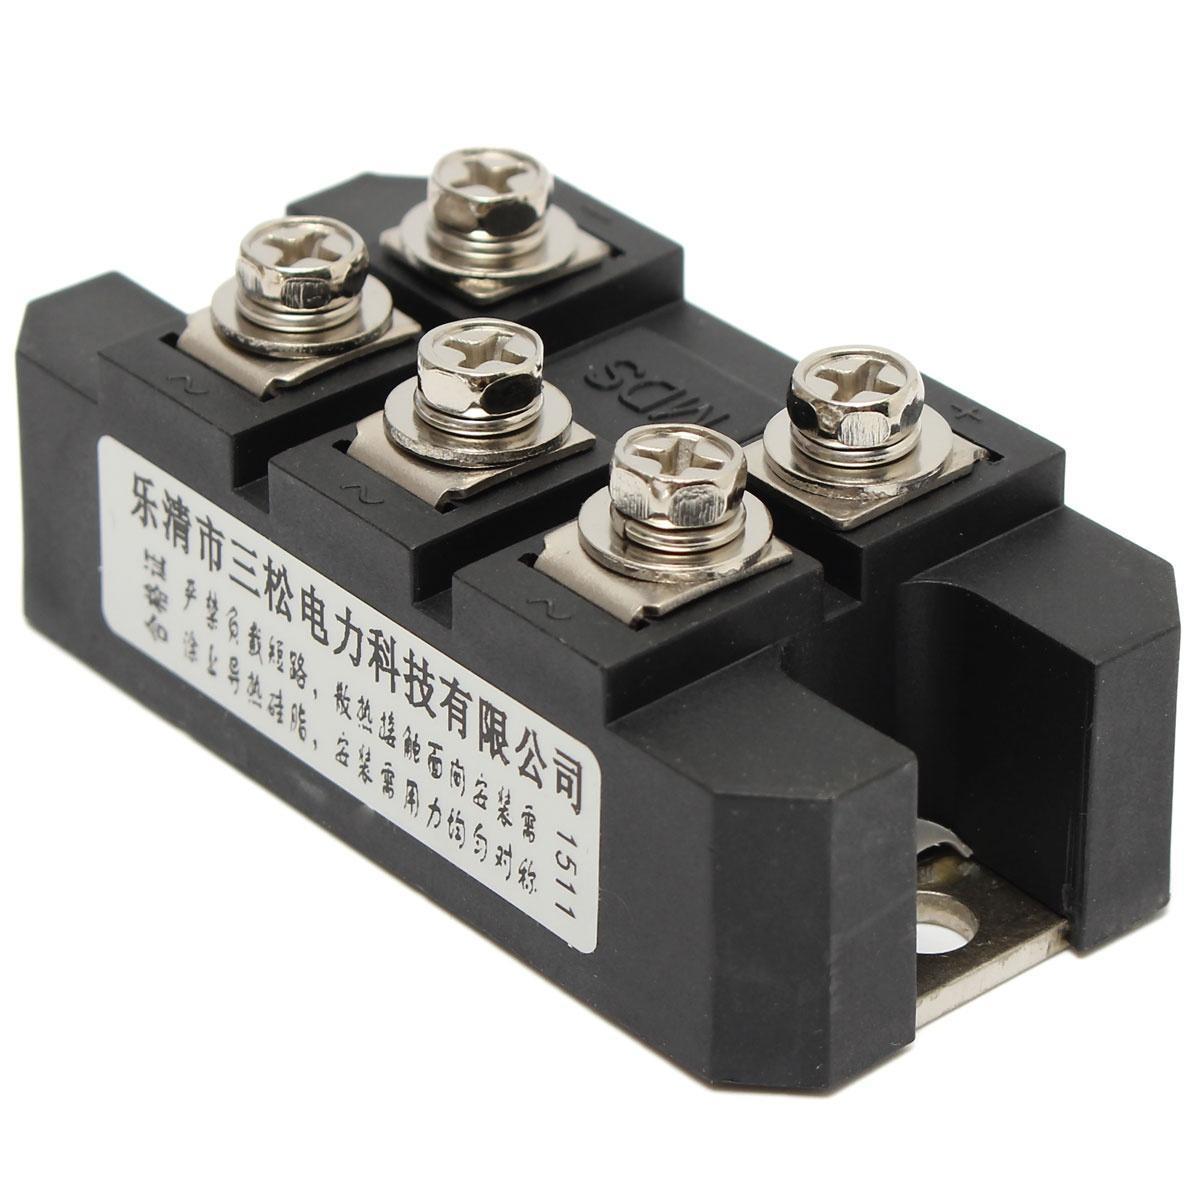 MDS150A диод трехфазный мост выпрямителя 150A Amp 1600V mitsubishi mds c1 v2 4535 mds c1 v2 4535